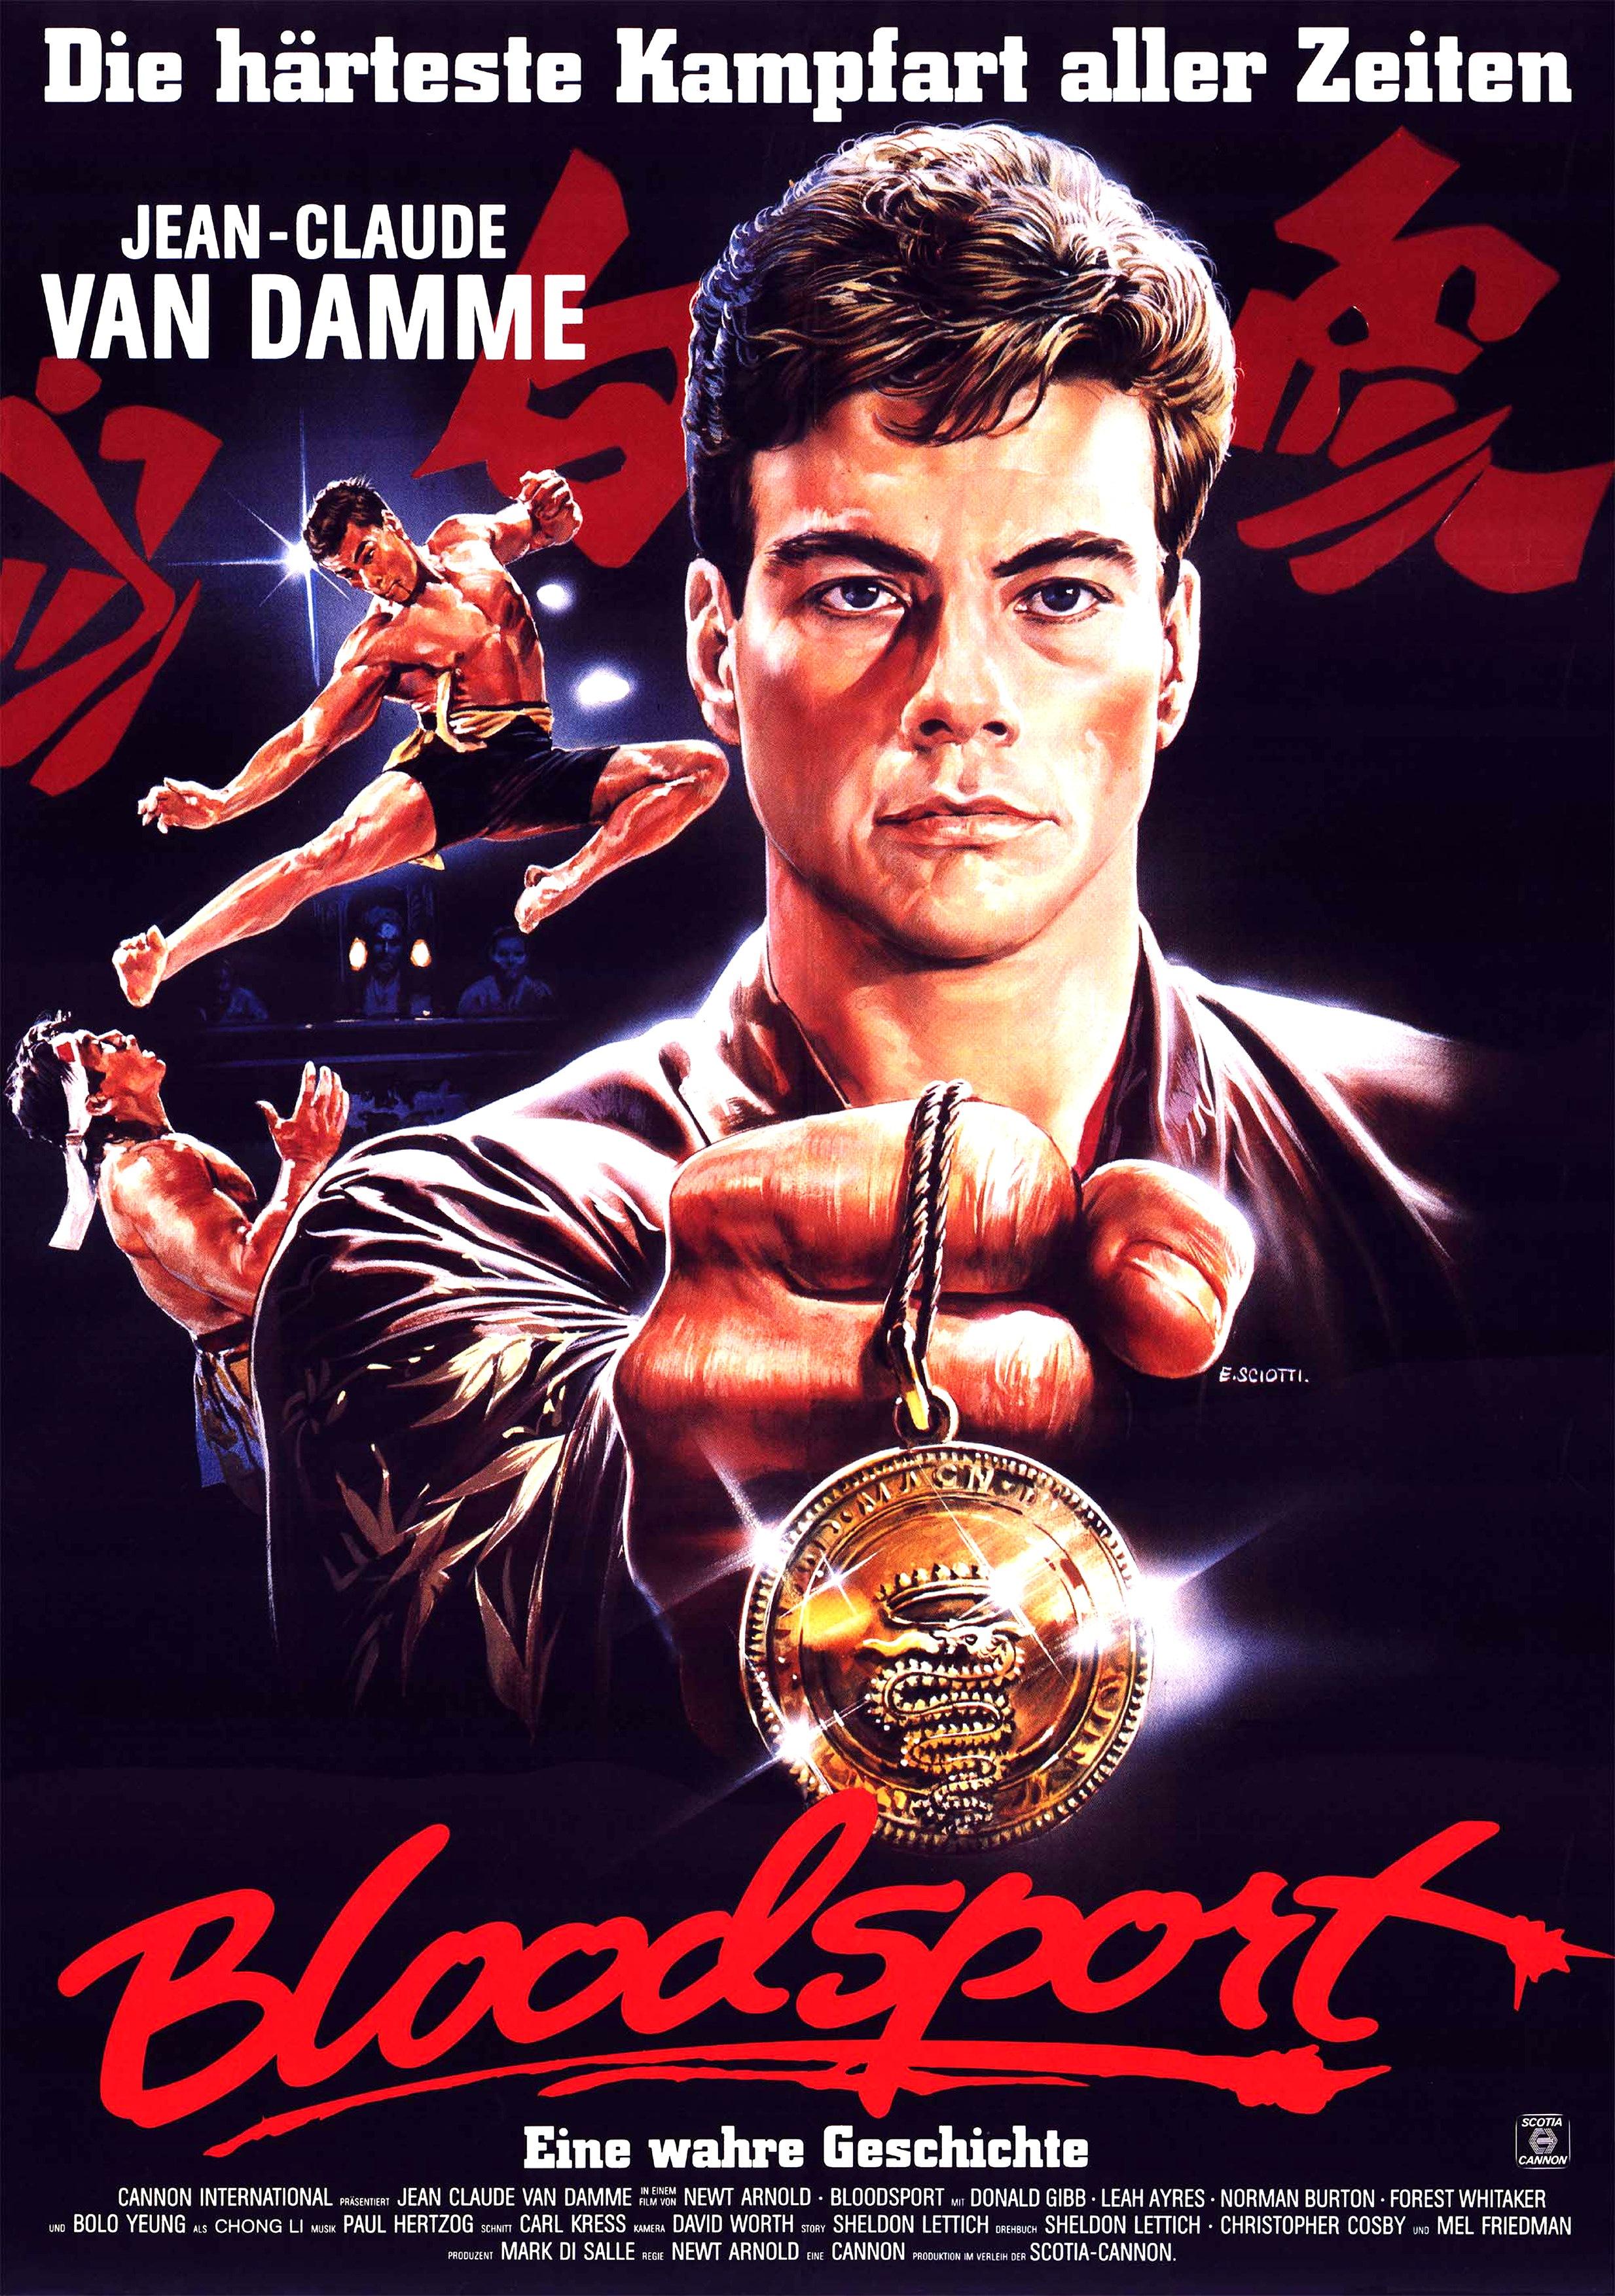 Van Damme Funny Interview Bloodsport Poster